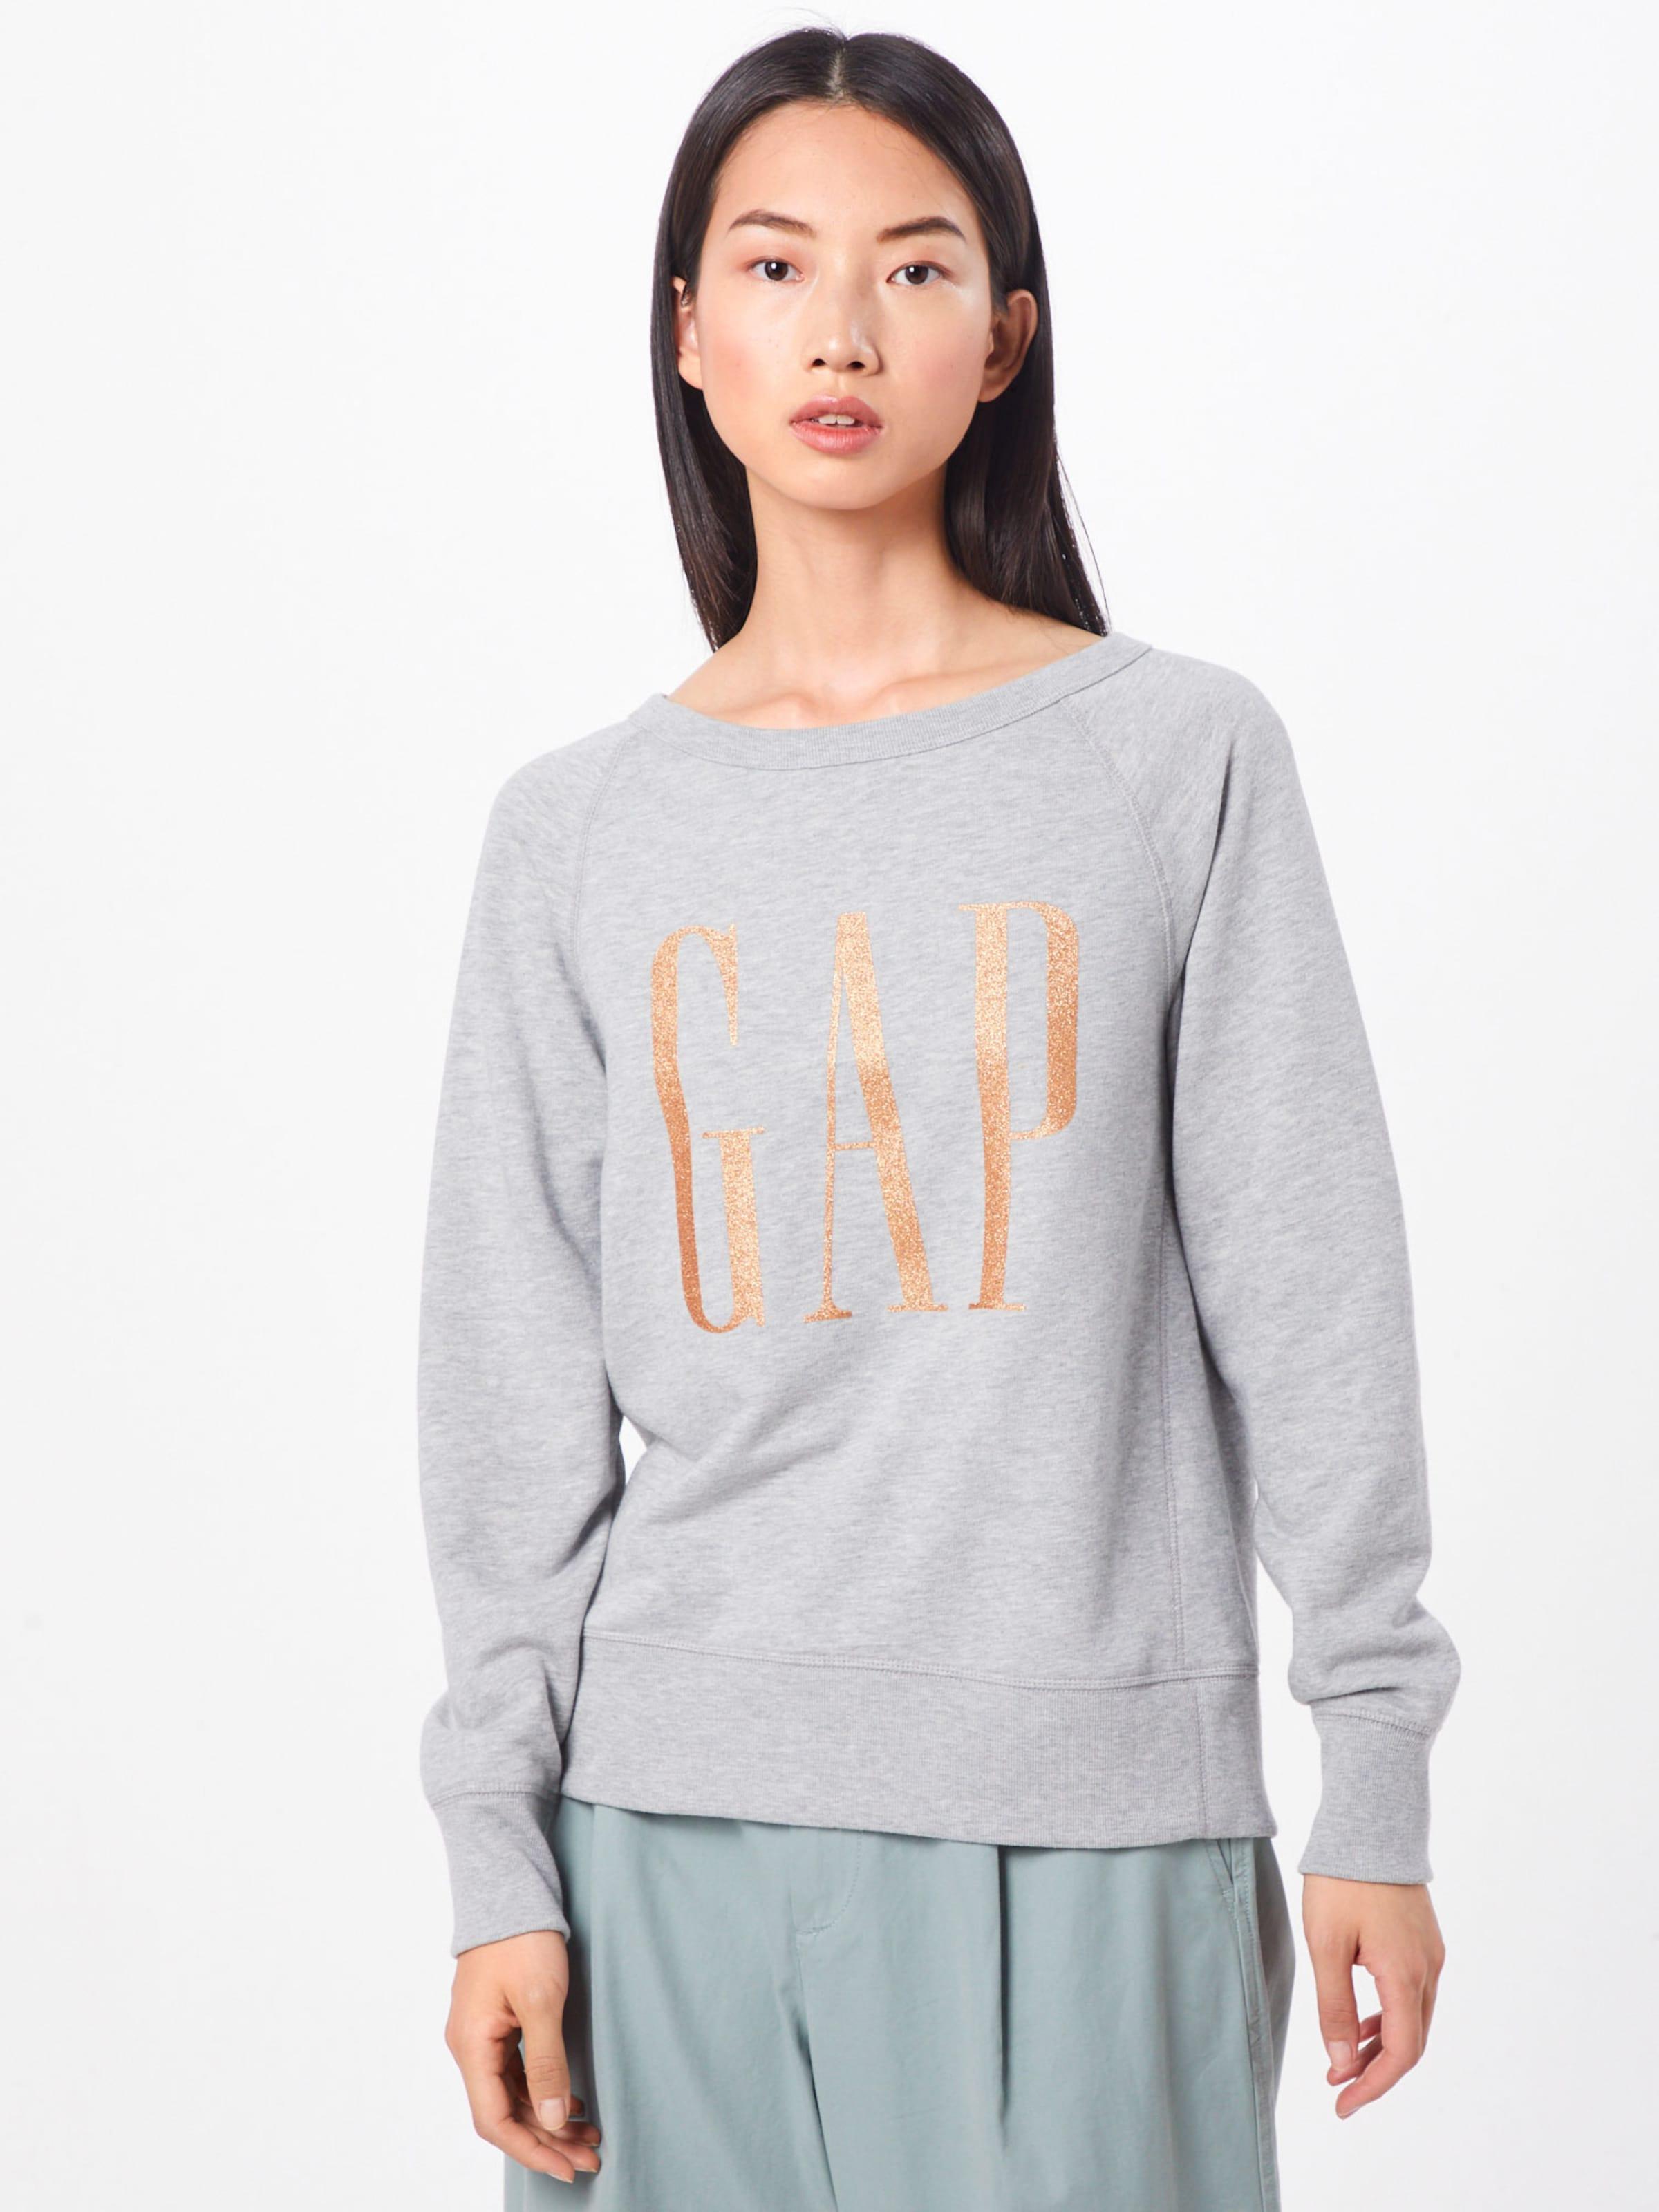 Gap Po' En 'glitter Chiné Sweat shirt Gris N8nZwP0kOX